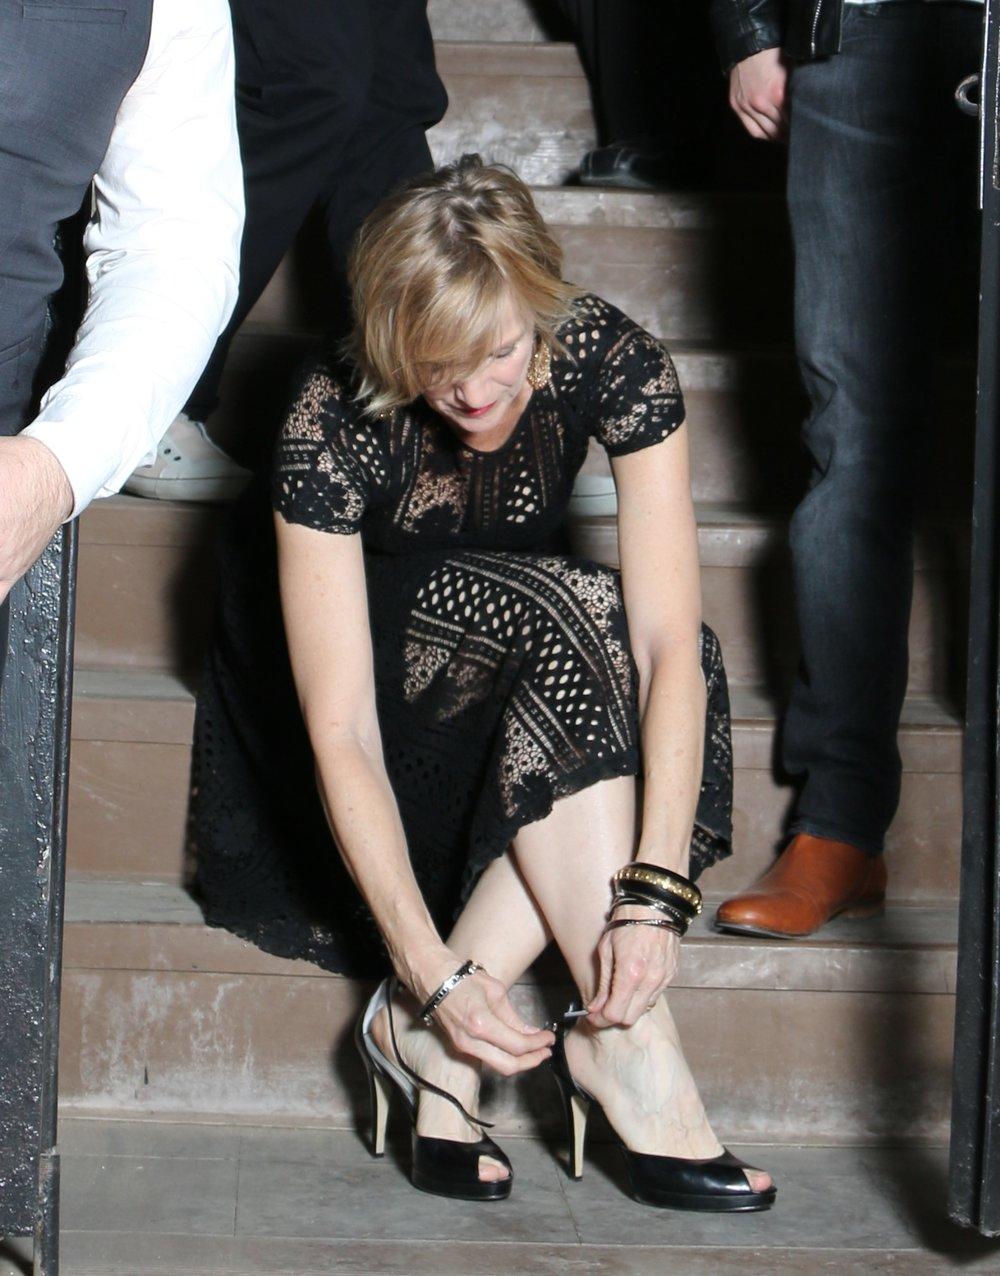 Leisa and shoe.jpg